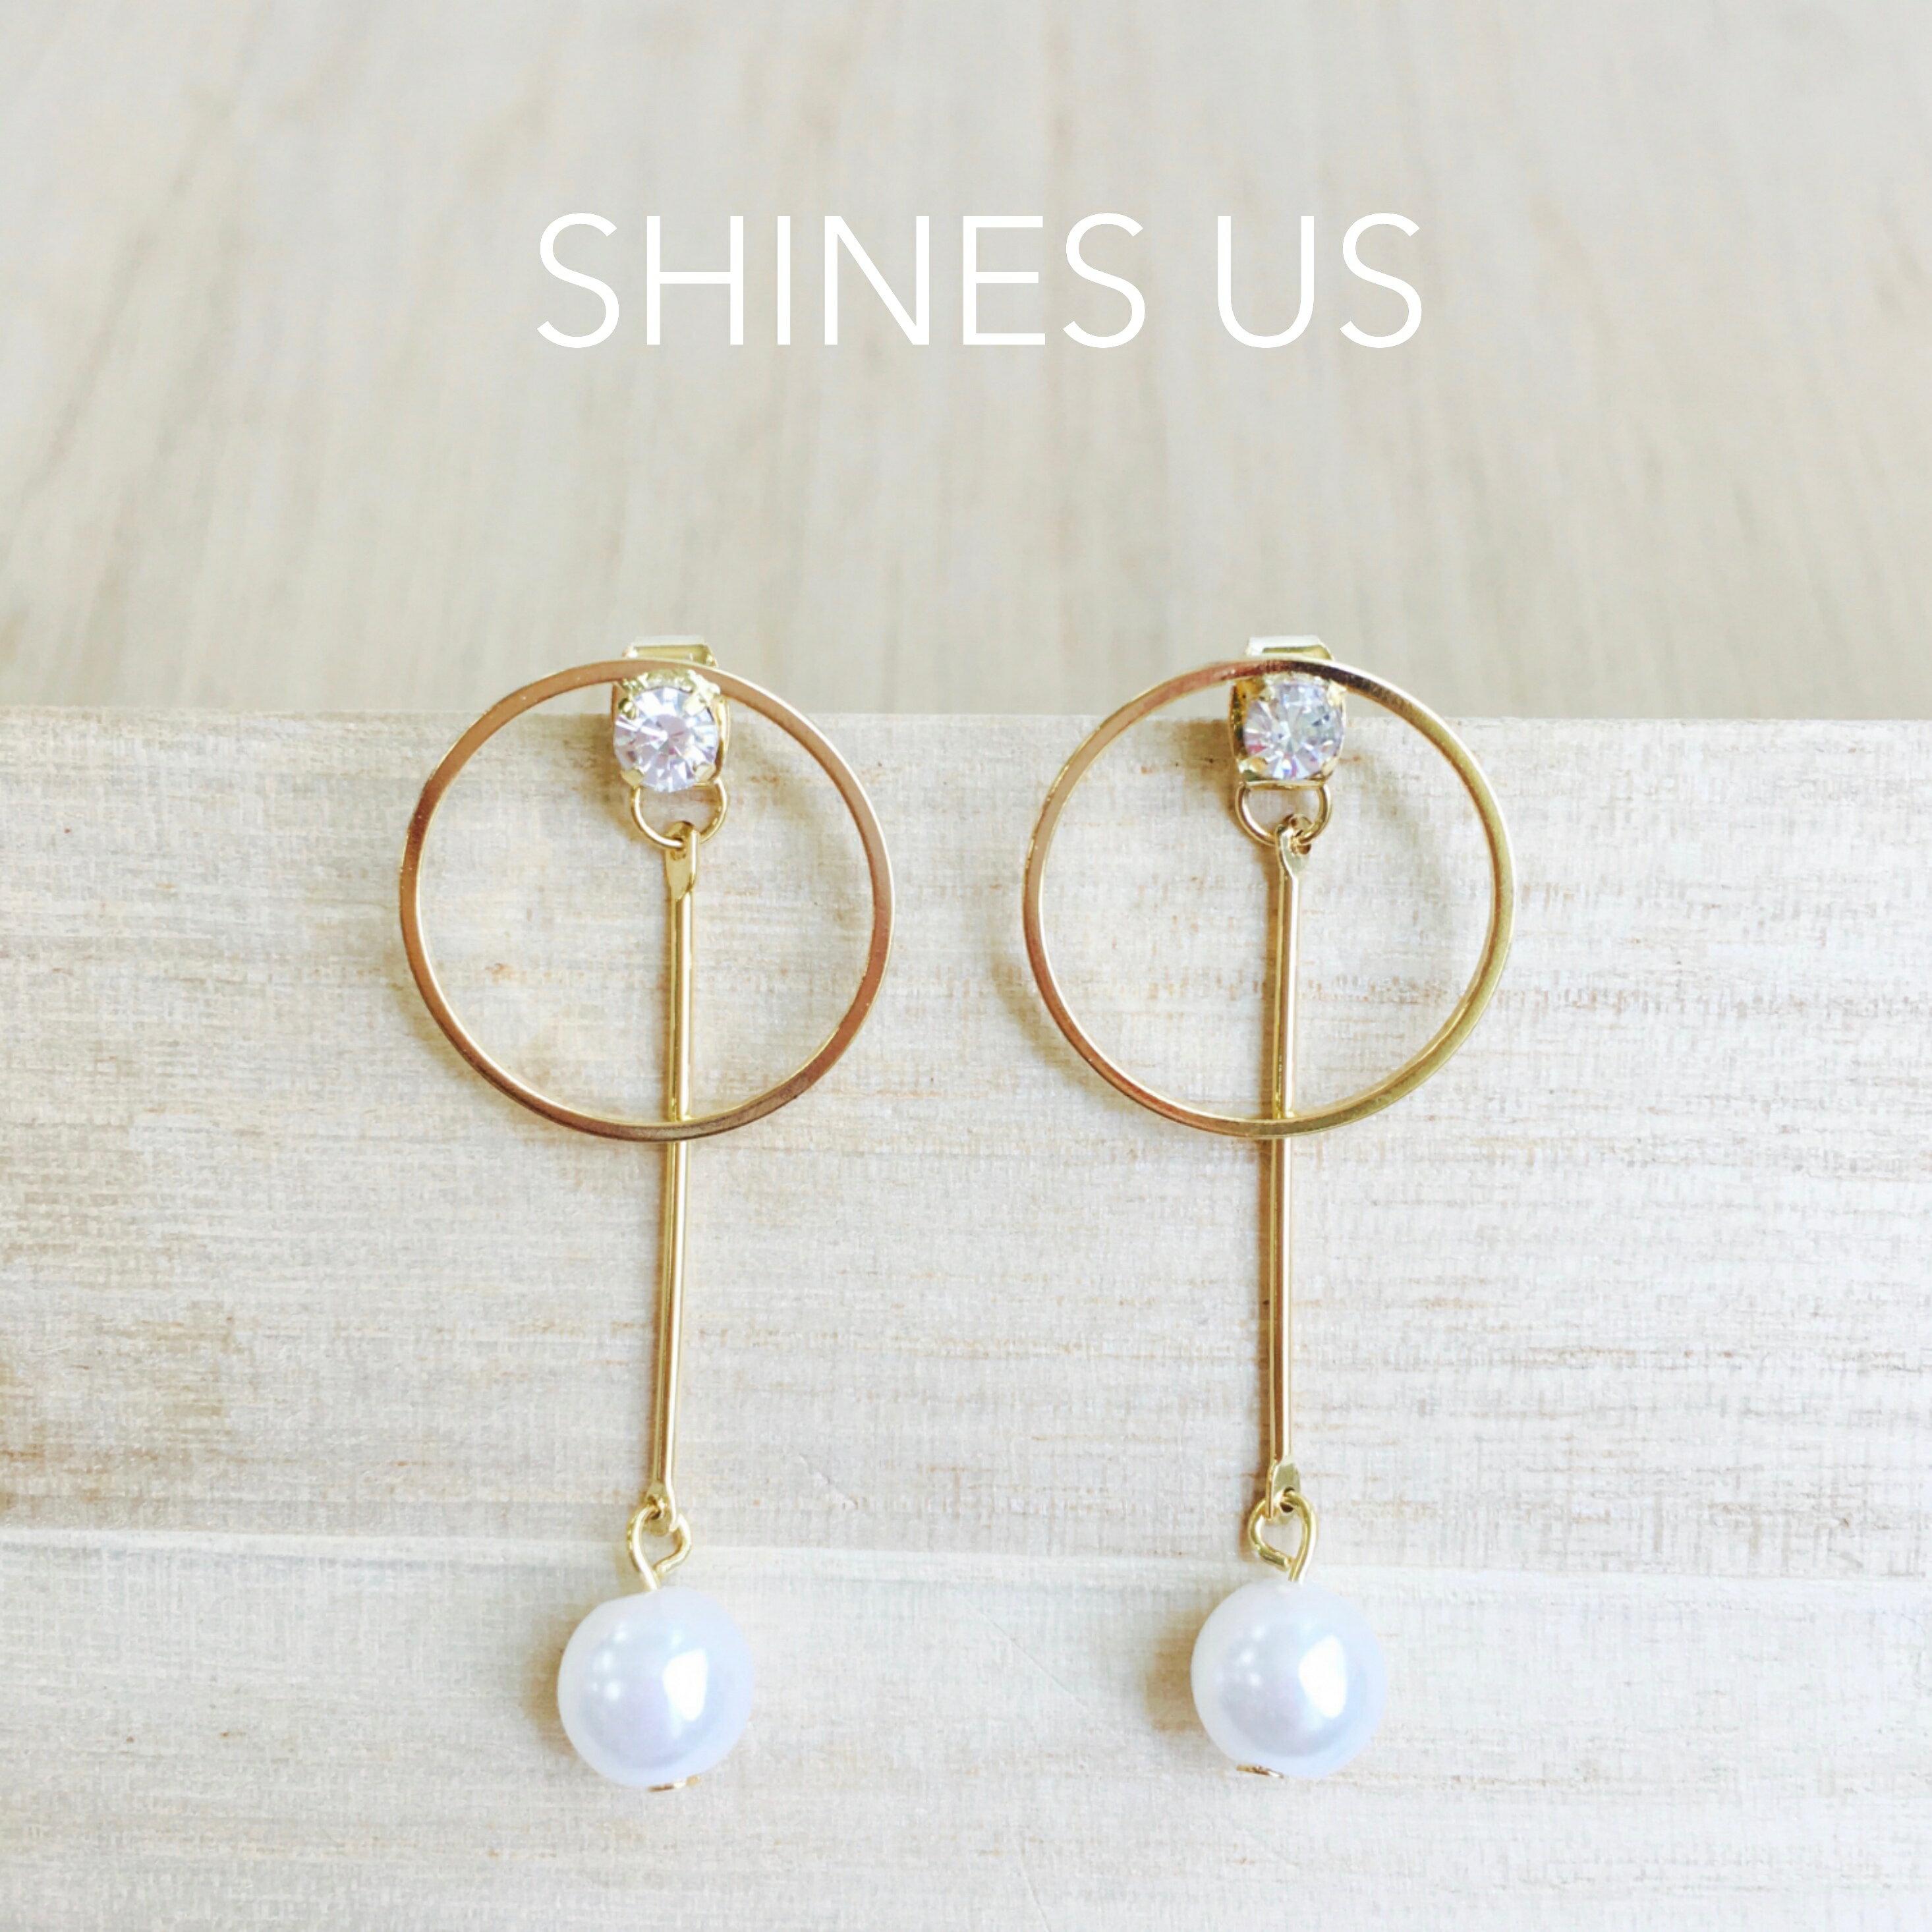 【SHINES US】正韓 珍珠節拍器前後釦耳環